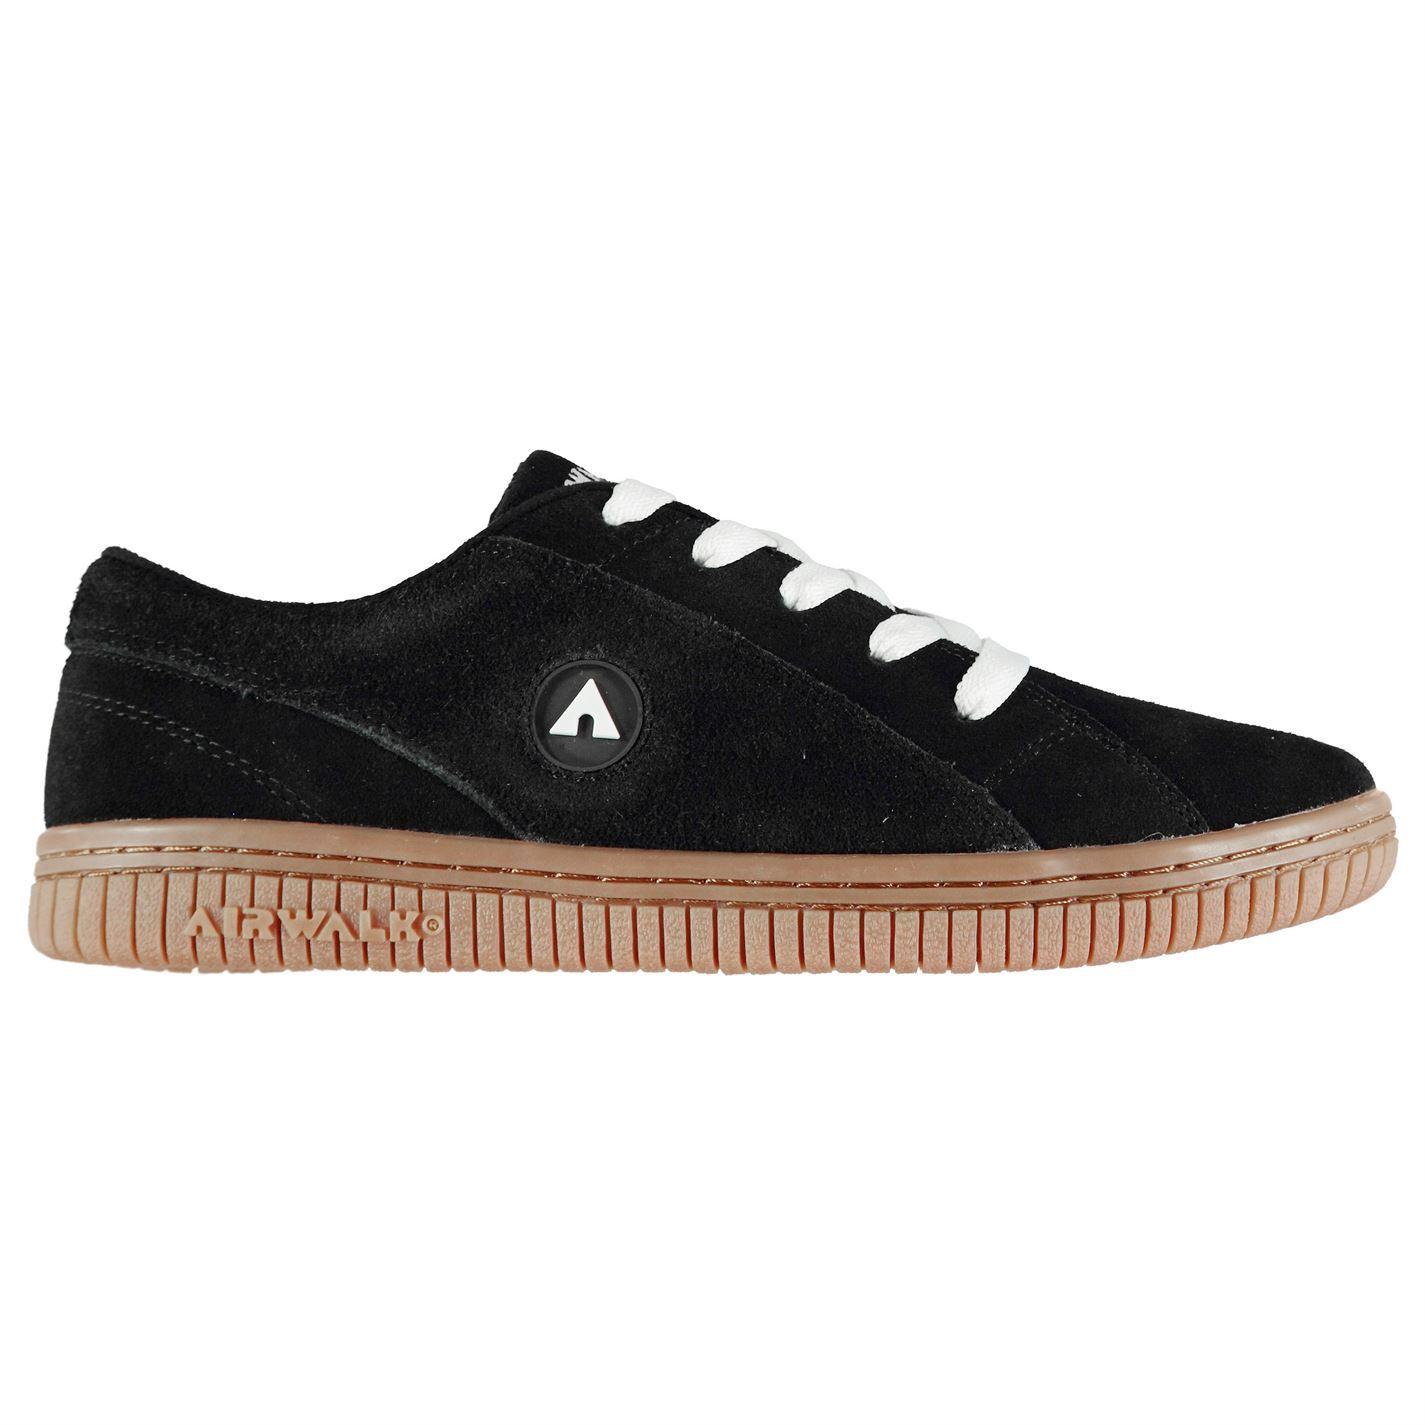 Airwalk The One Skate Shoes Mens